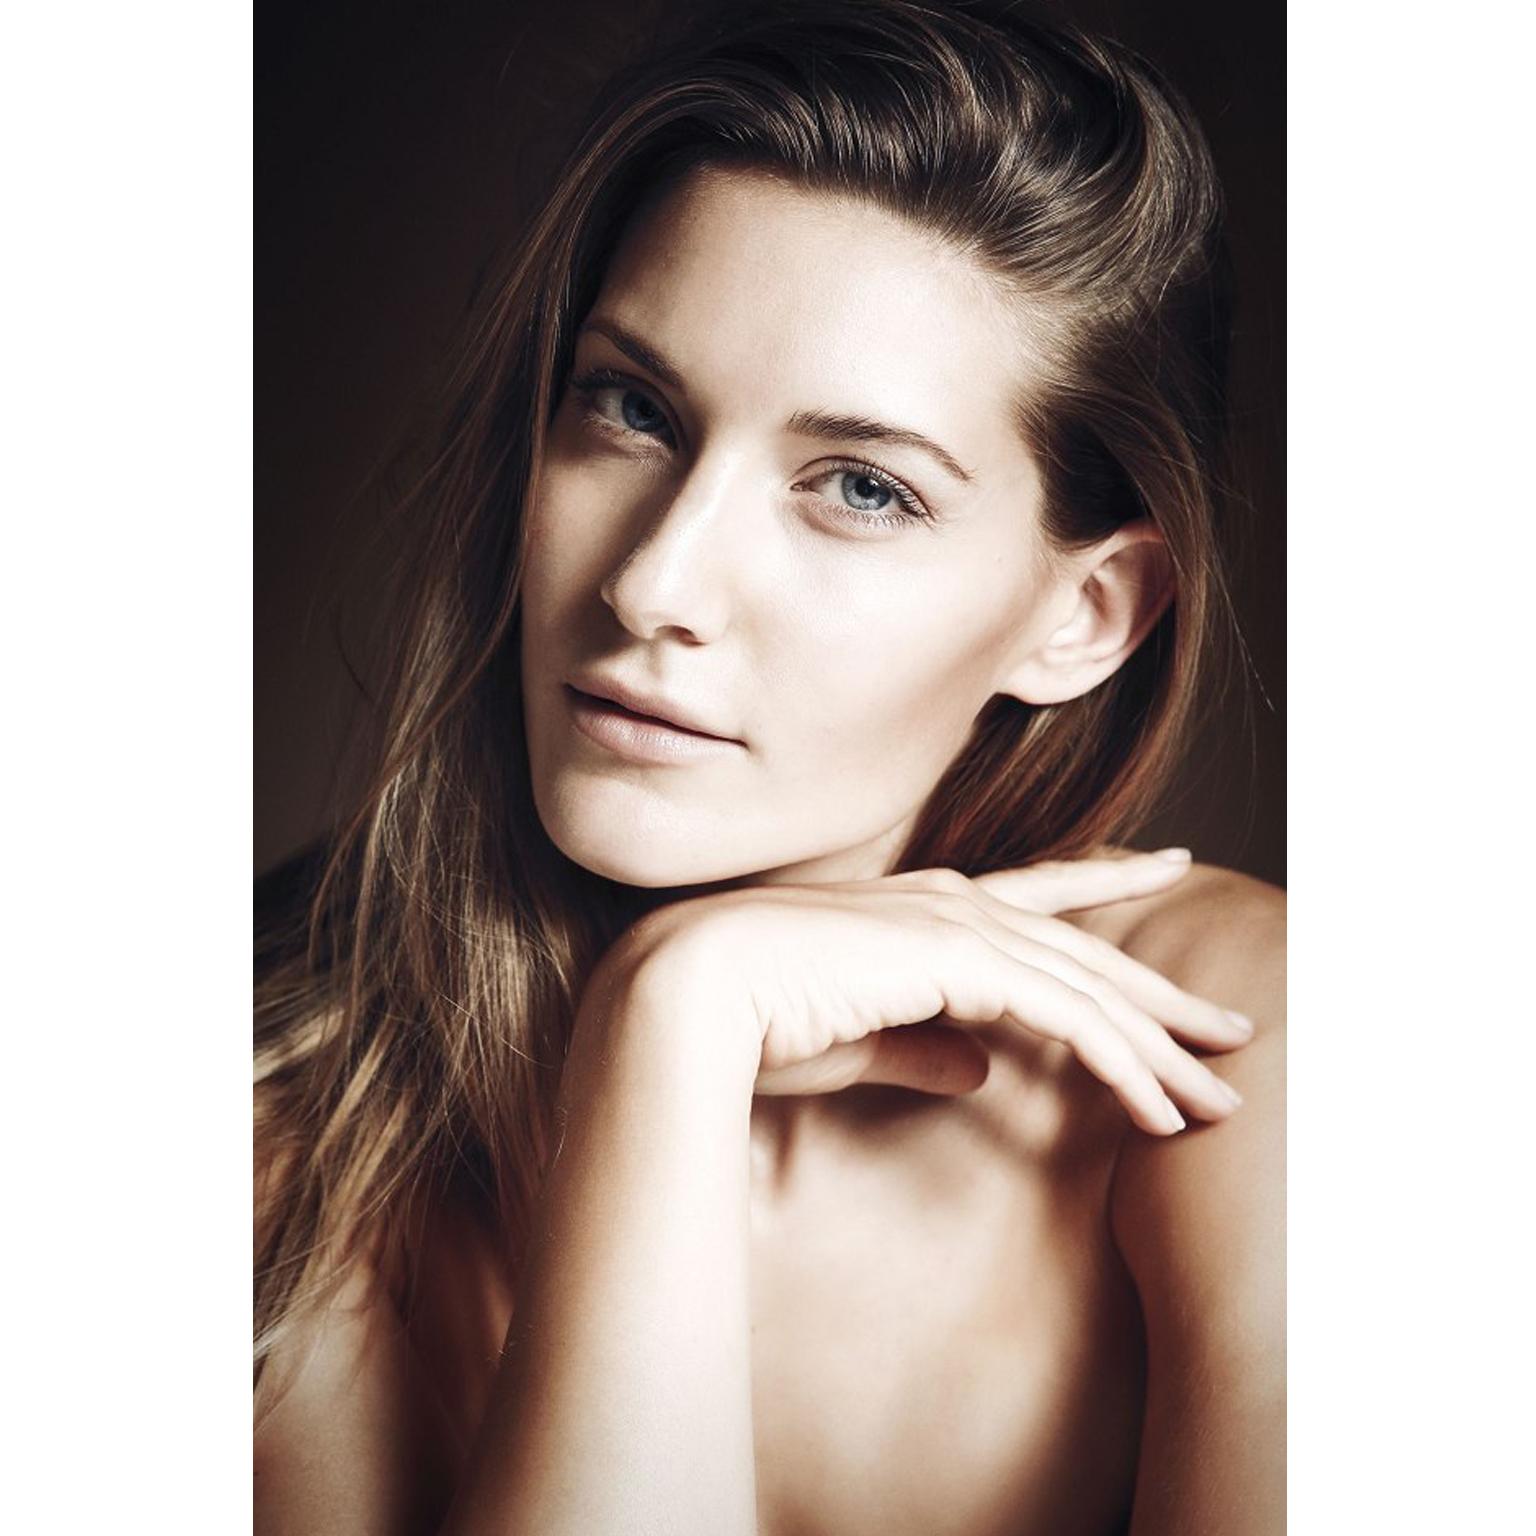 Toronto-Fitness-Model-Agency-Beauty-Portrait-Amanda-La-Magna